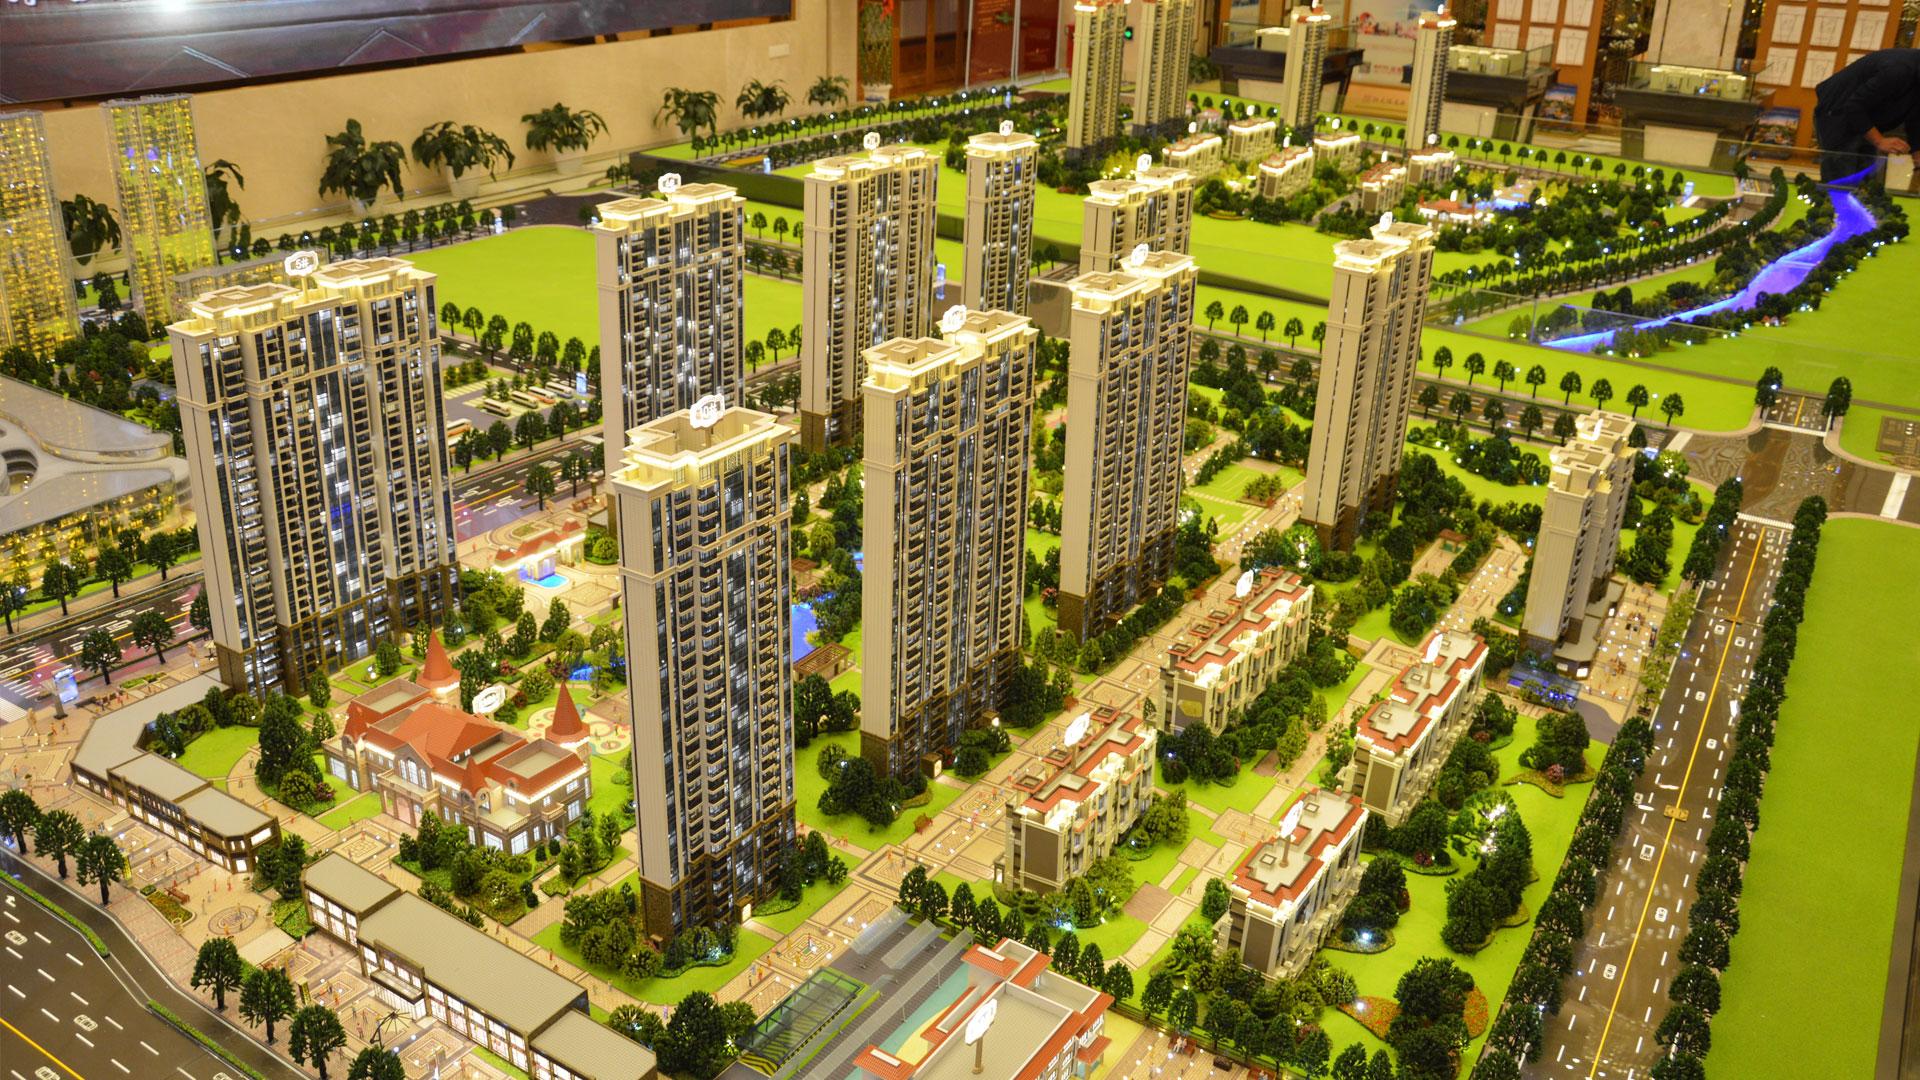 High end housing model